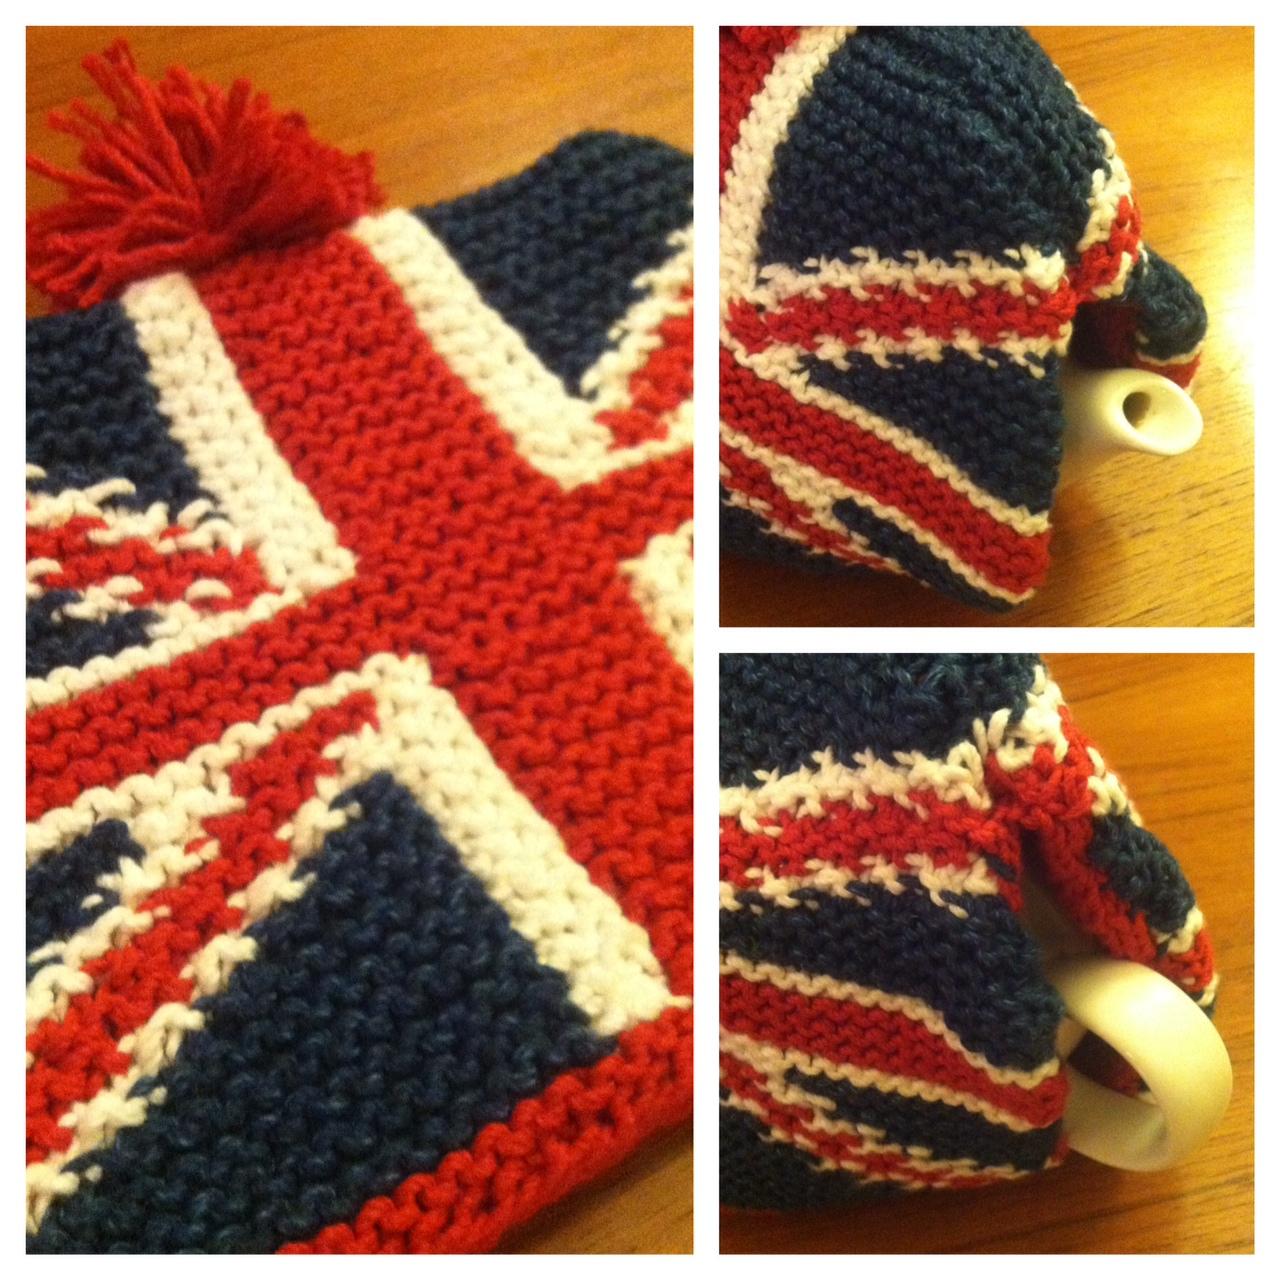 anna knits, etc.: anna knits - union jack tea cosy update 5